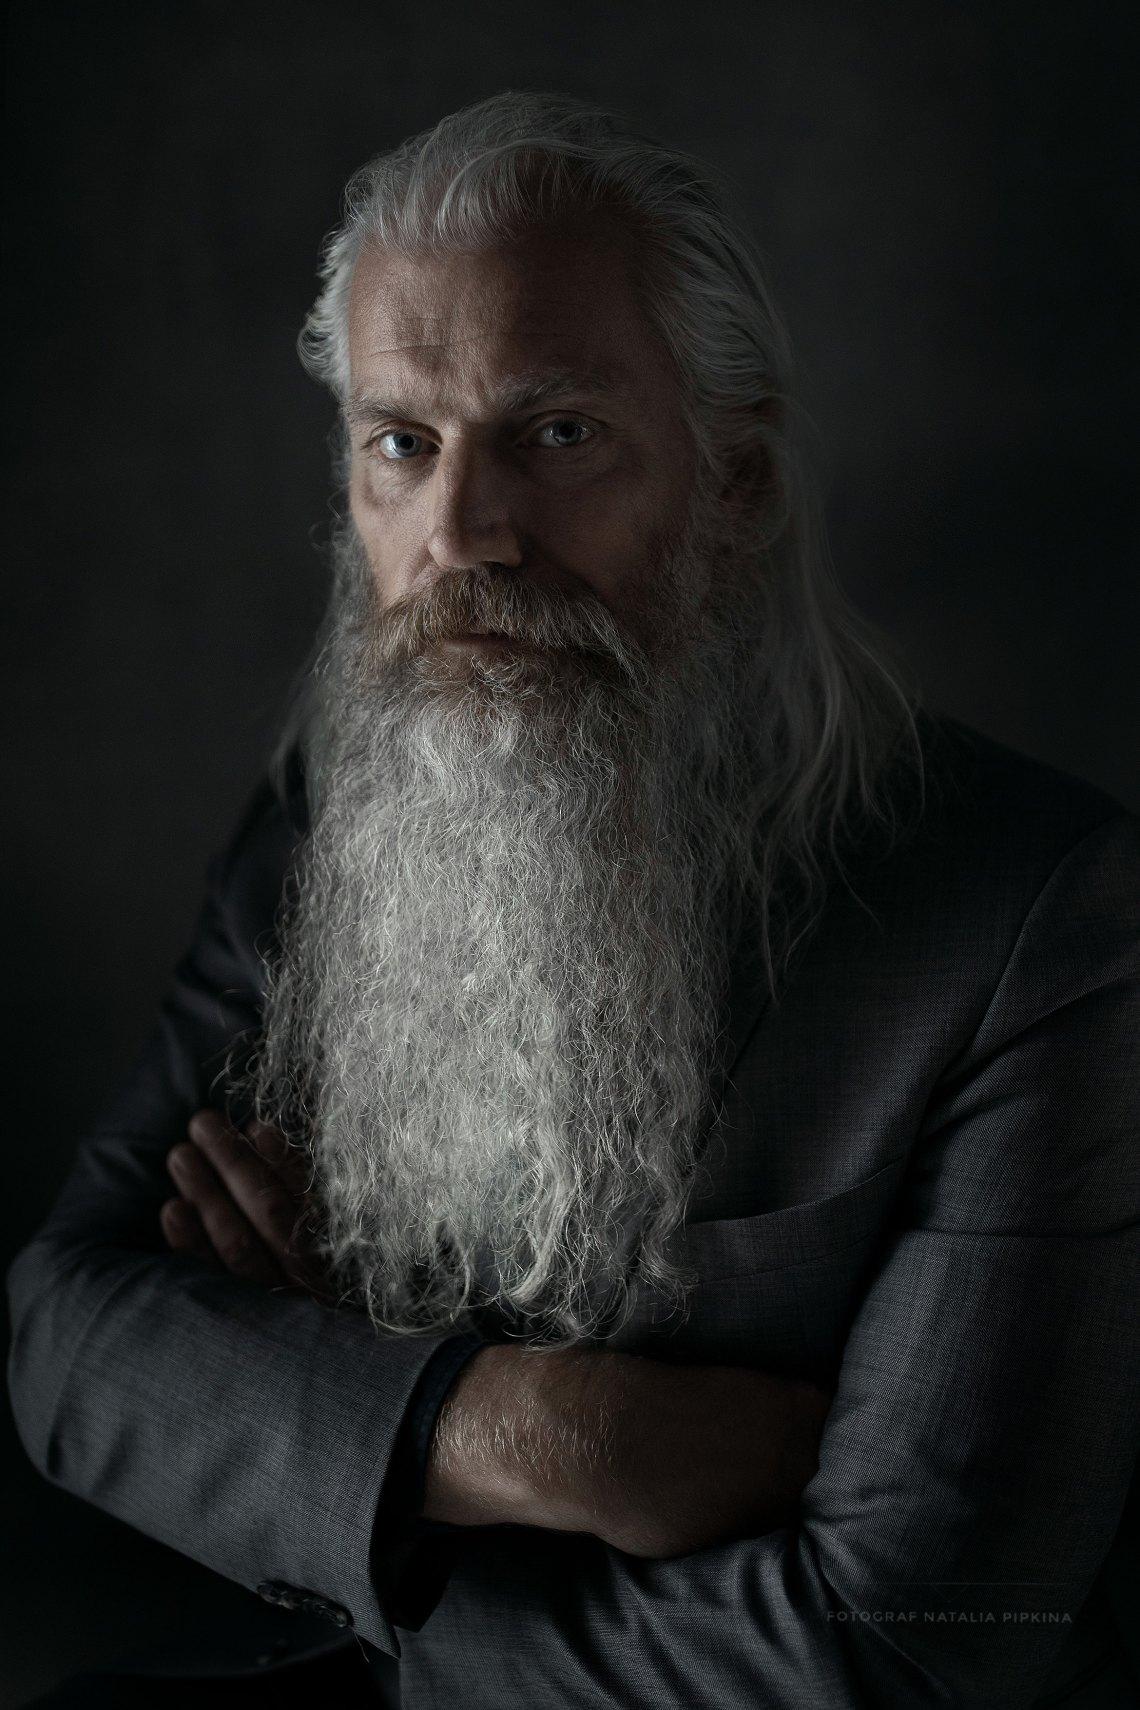 portrettfotografering-Oslo-portrettfotograf-art-fotograf-kunstneriske portretter